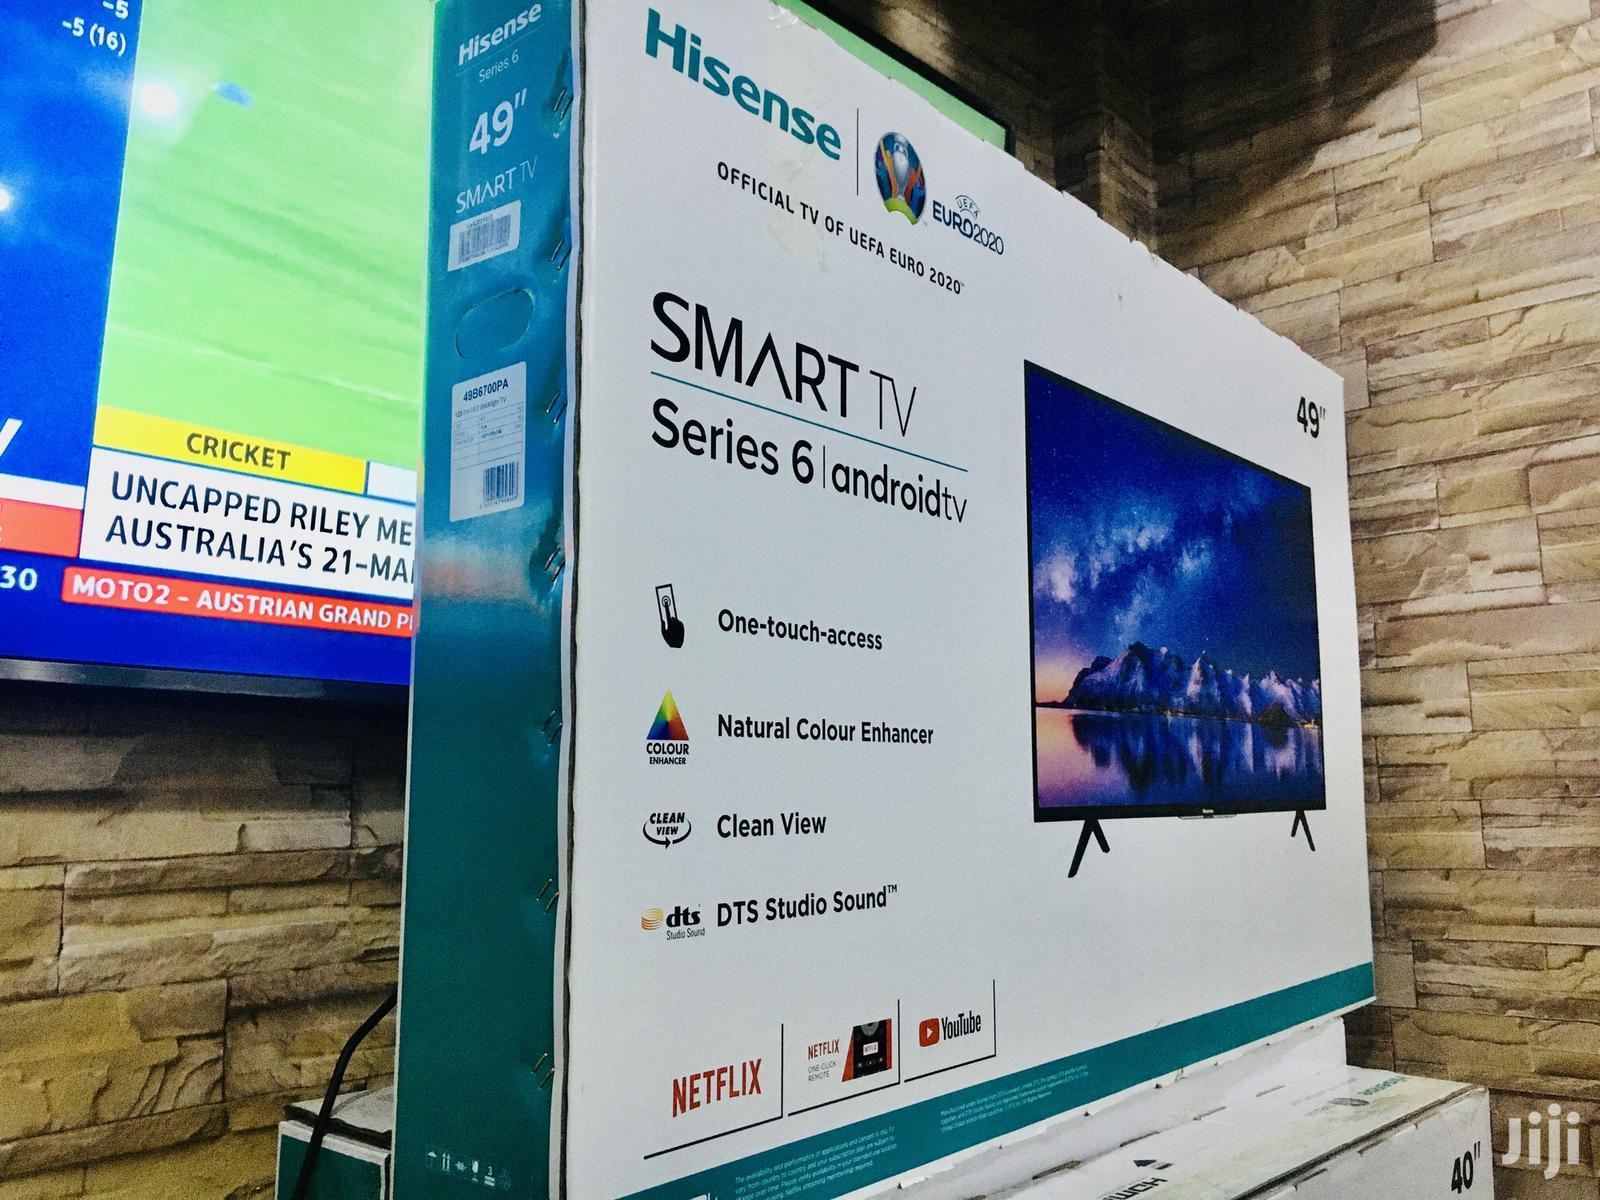 Hisense 49 Inch Smart Tv